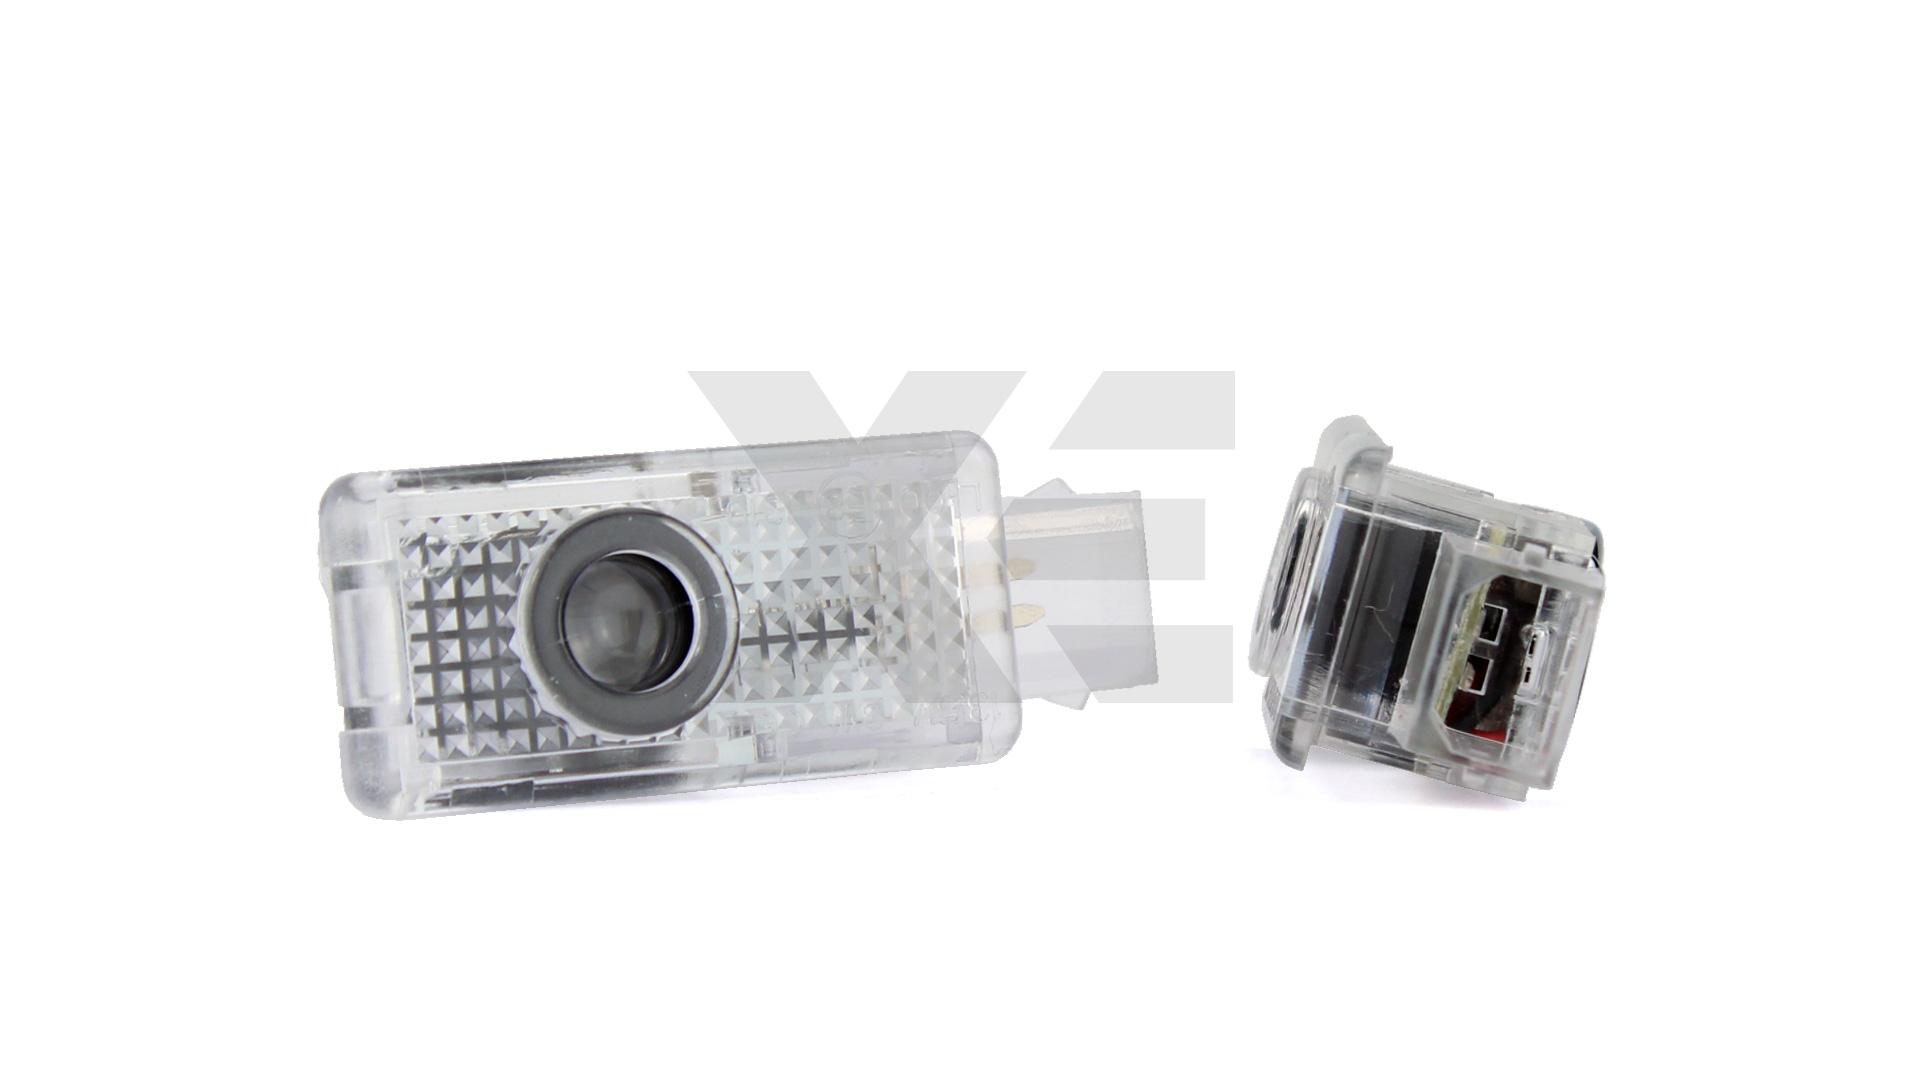 Kit Placche Led Sottoporta Proiettore Logo Audi - A3 A4 A5 A6 A8 R8 TT Q5 Q7